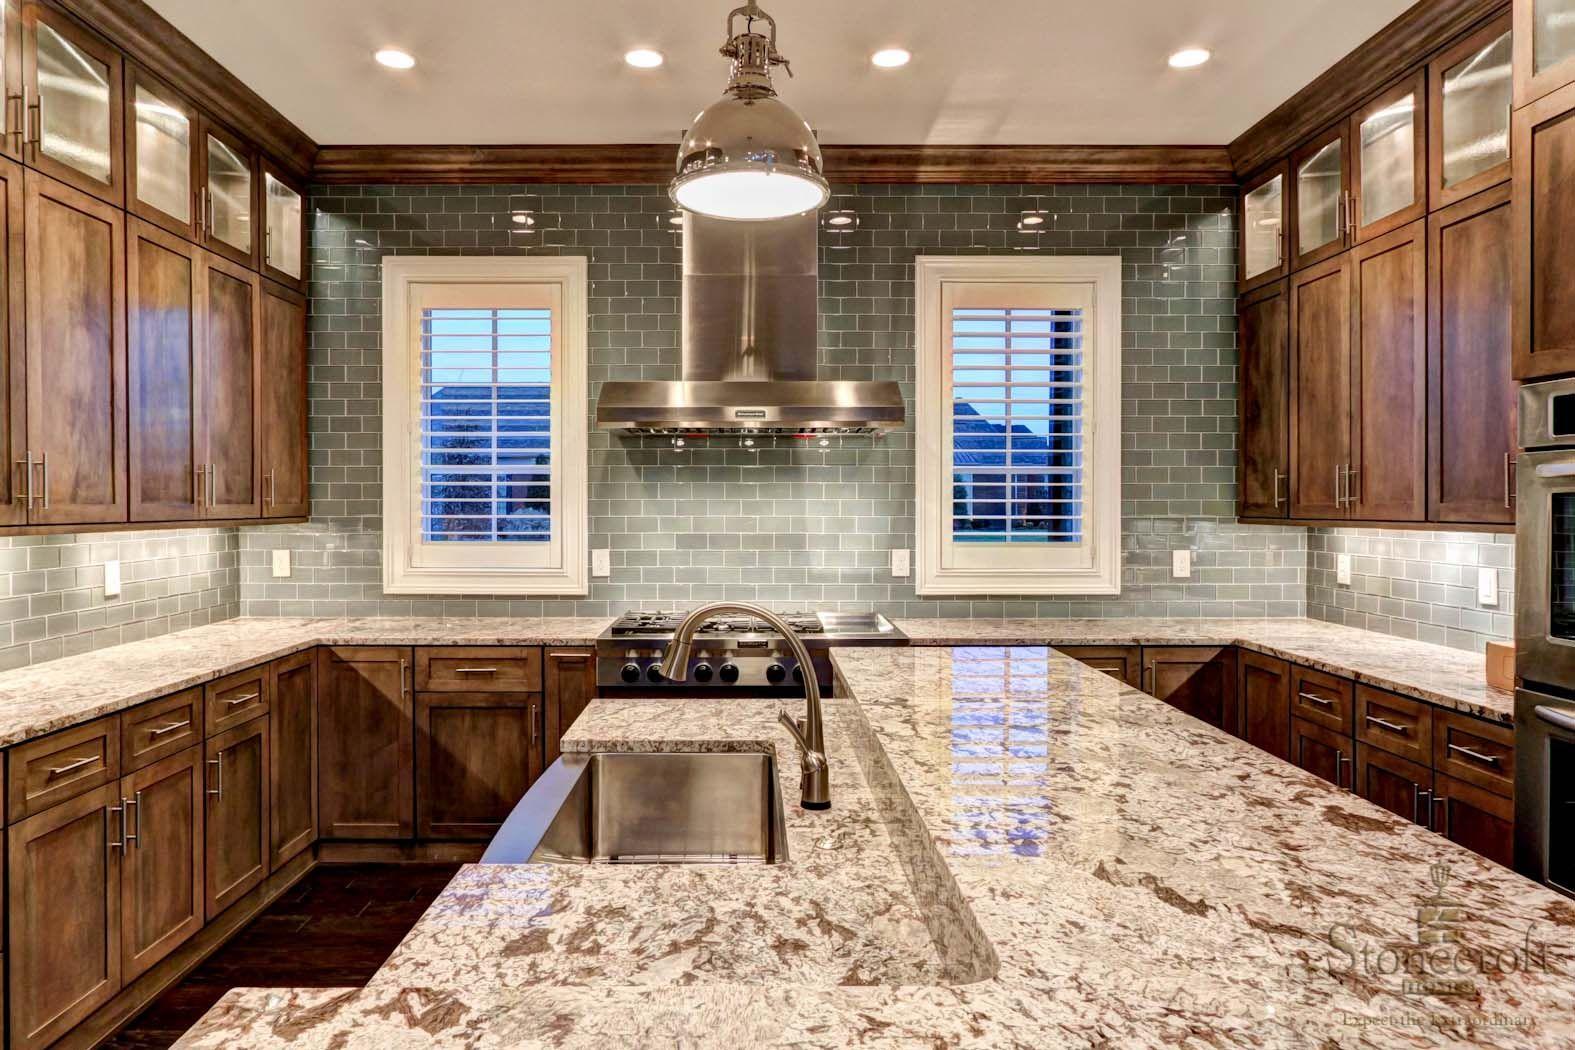 Stonecroft Homes Adams Place Louisville Custom Builder Home Custom Builder Home Kitchens